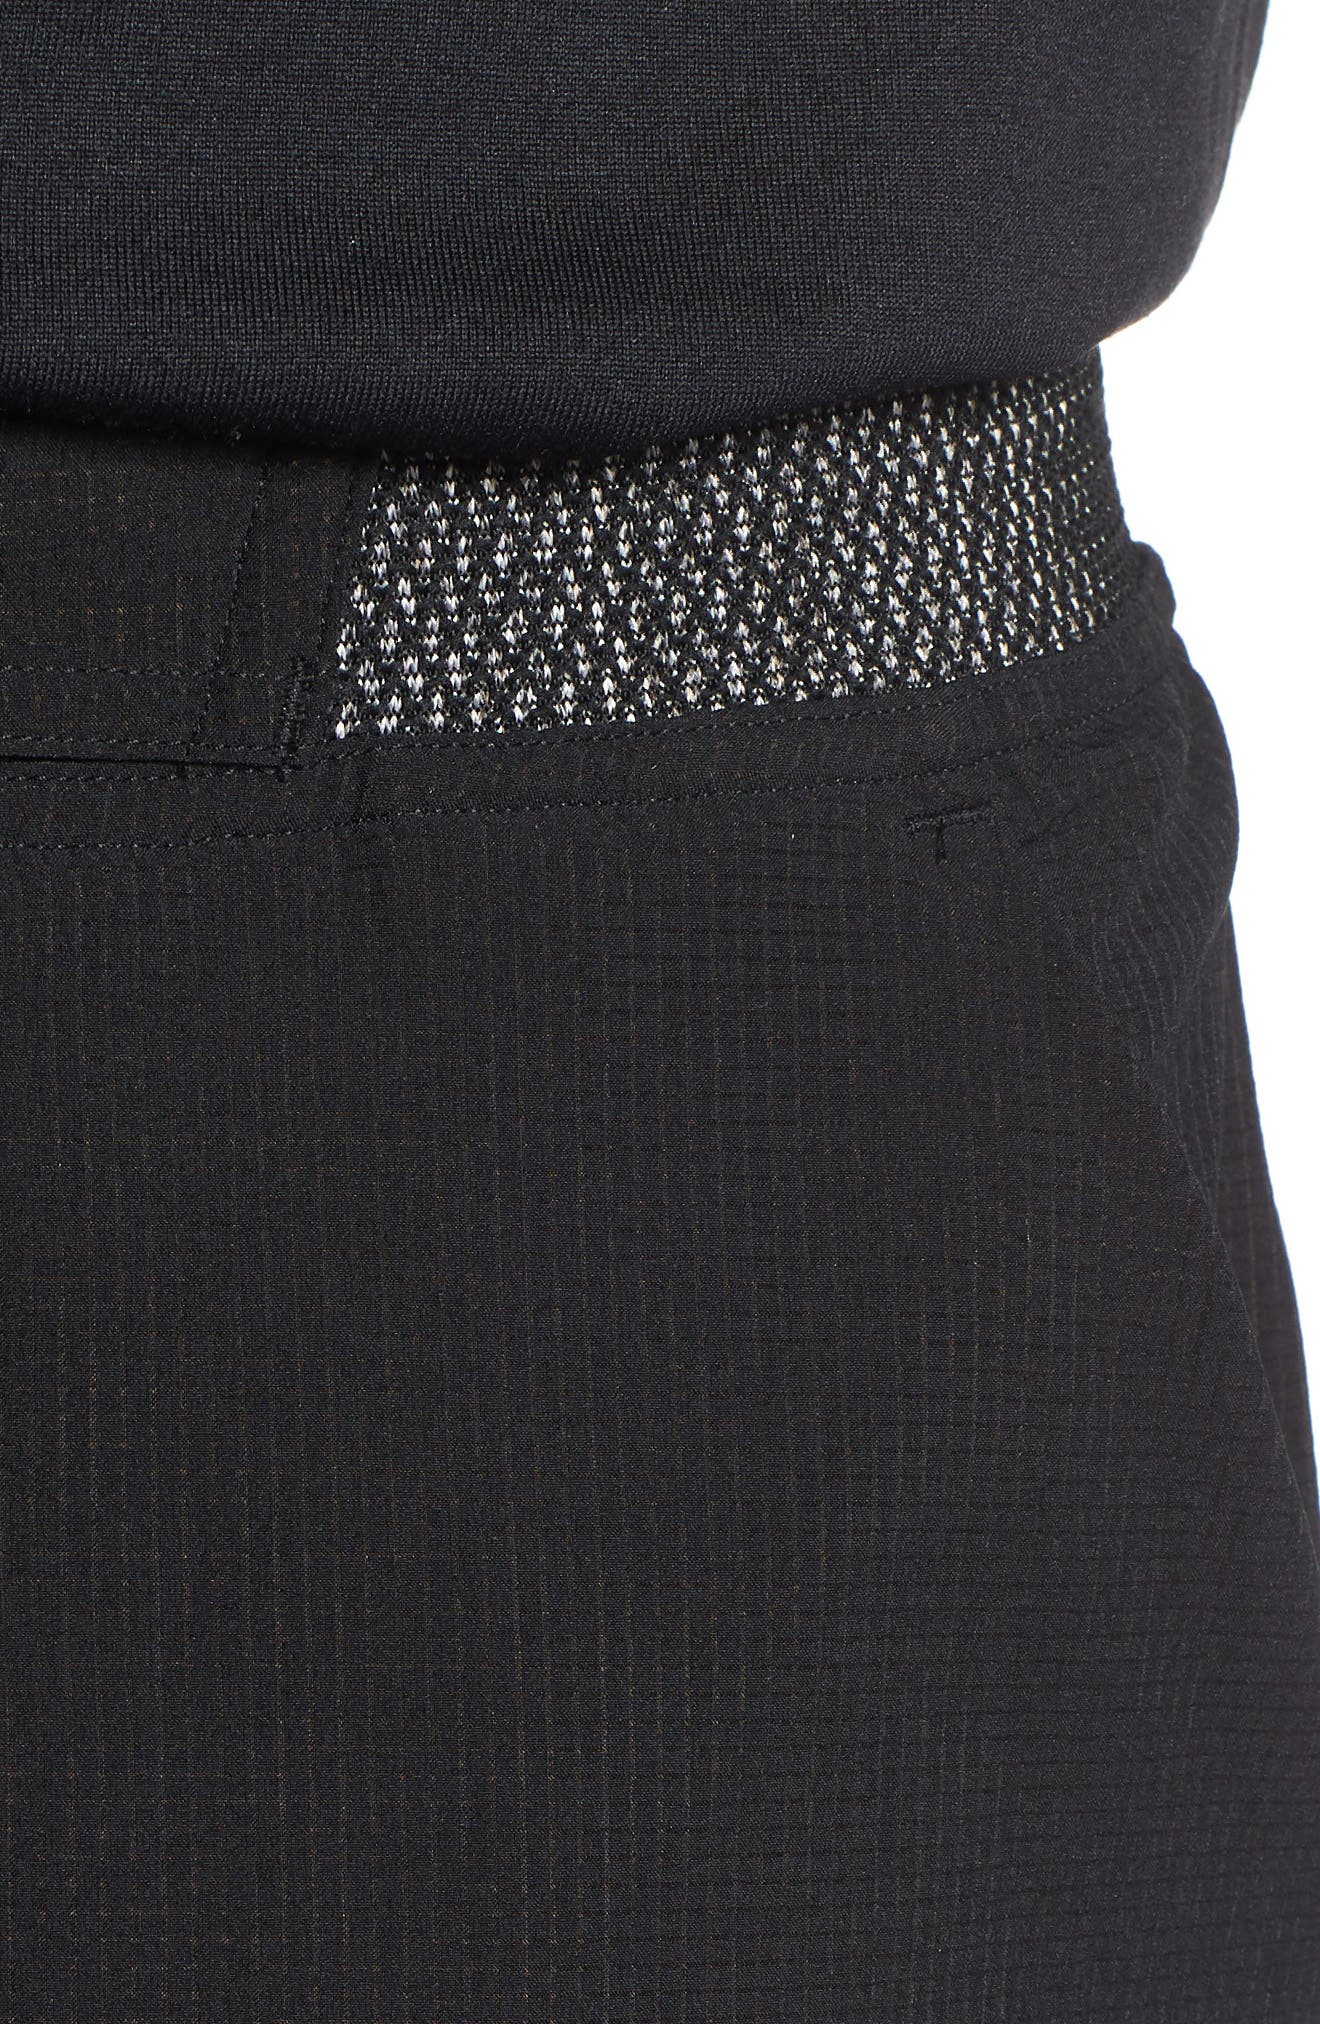 Epic Knit Shorts,                             Alternate thumbnail 4, color,                             005